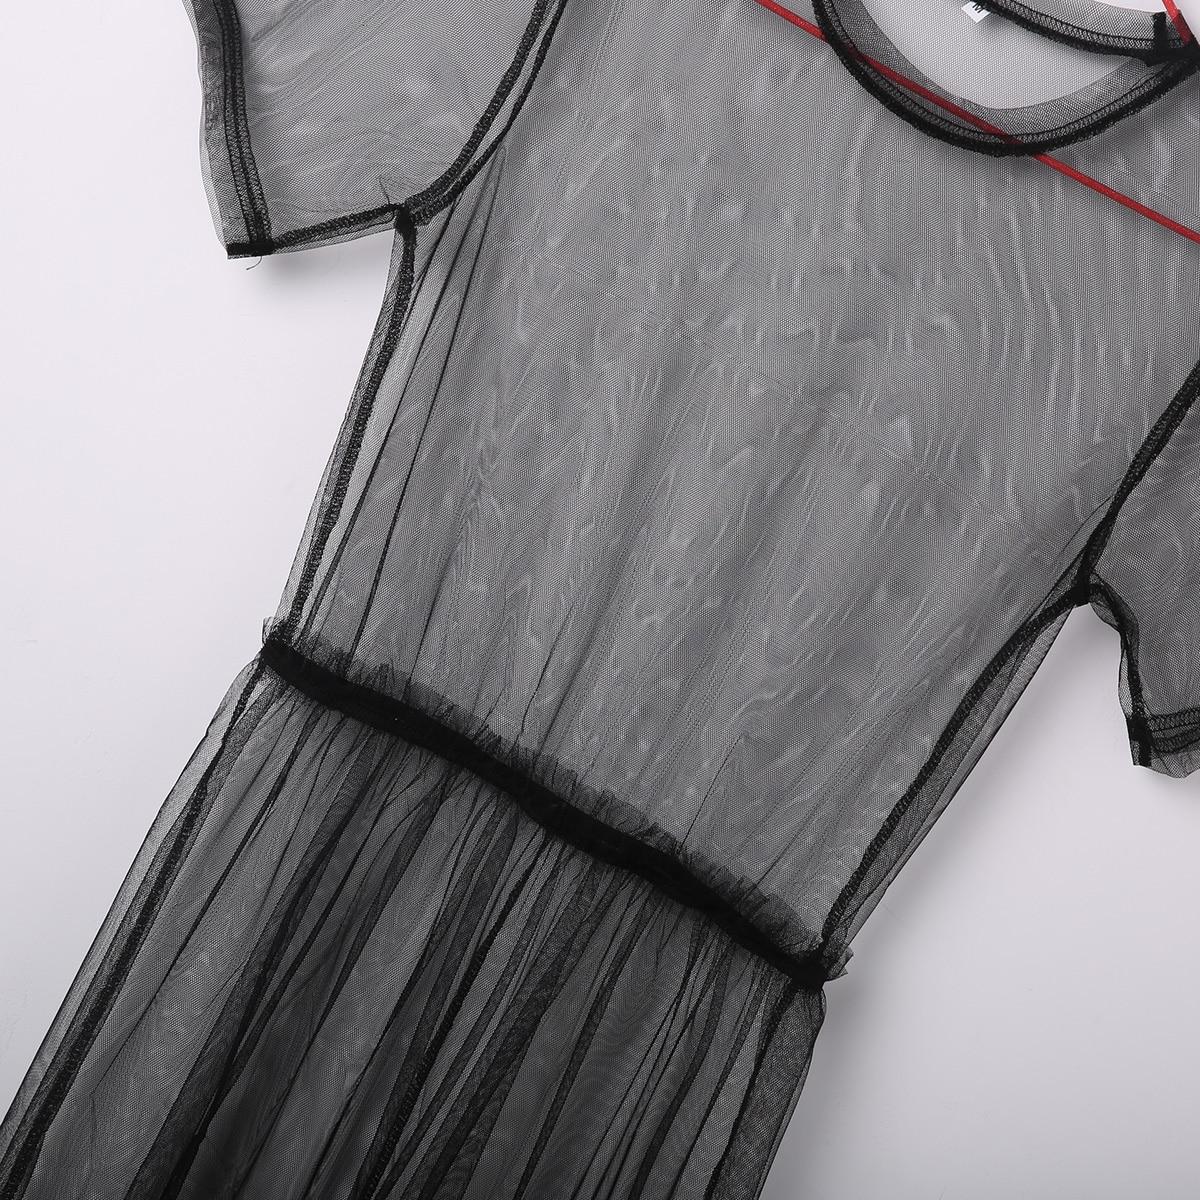 415ca4998a91e 2019 Women Sexy Solid Black Fishnet Bathing Swimming Bikini Cover Up Shell  Scarf Mesh Scarves Swimwear Swimsuit Dress Beachwear